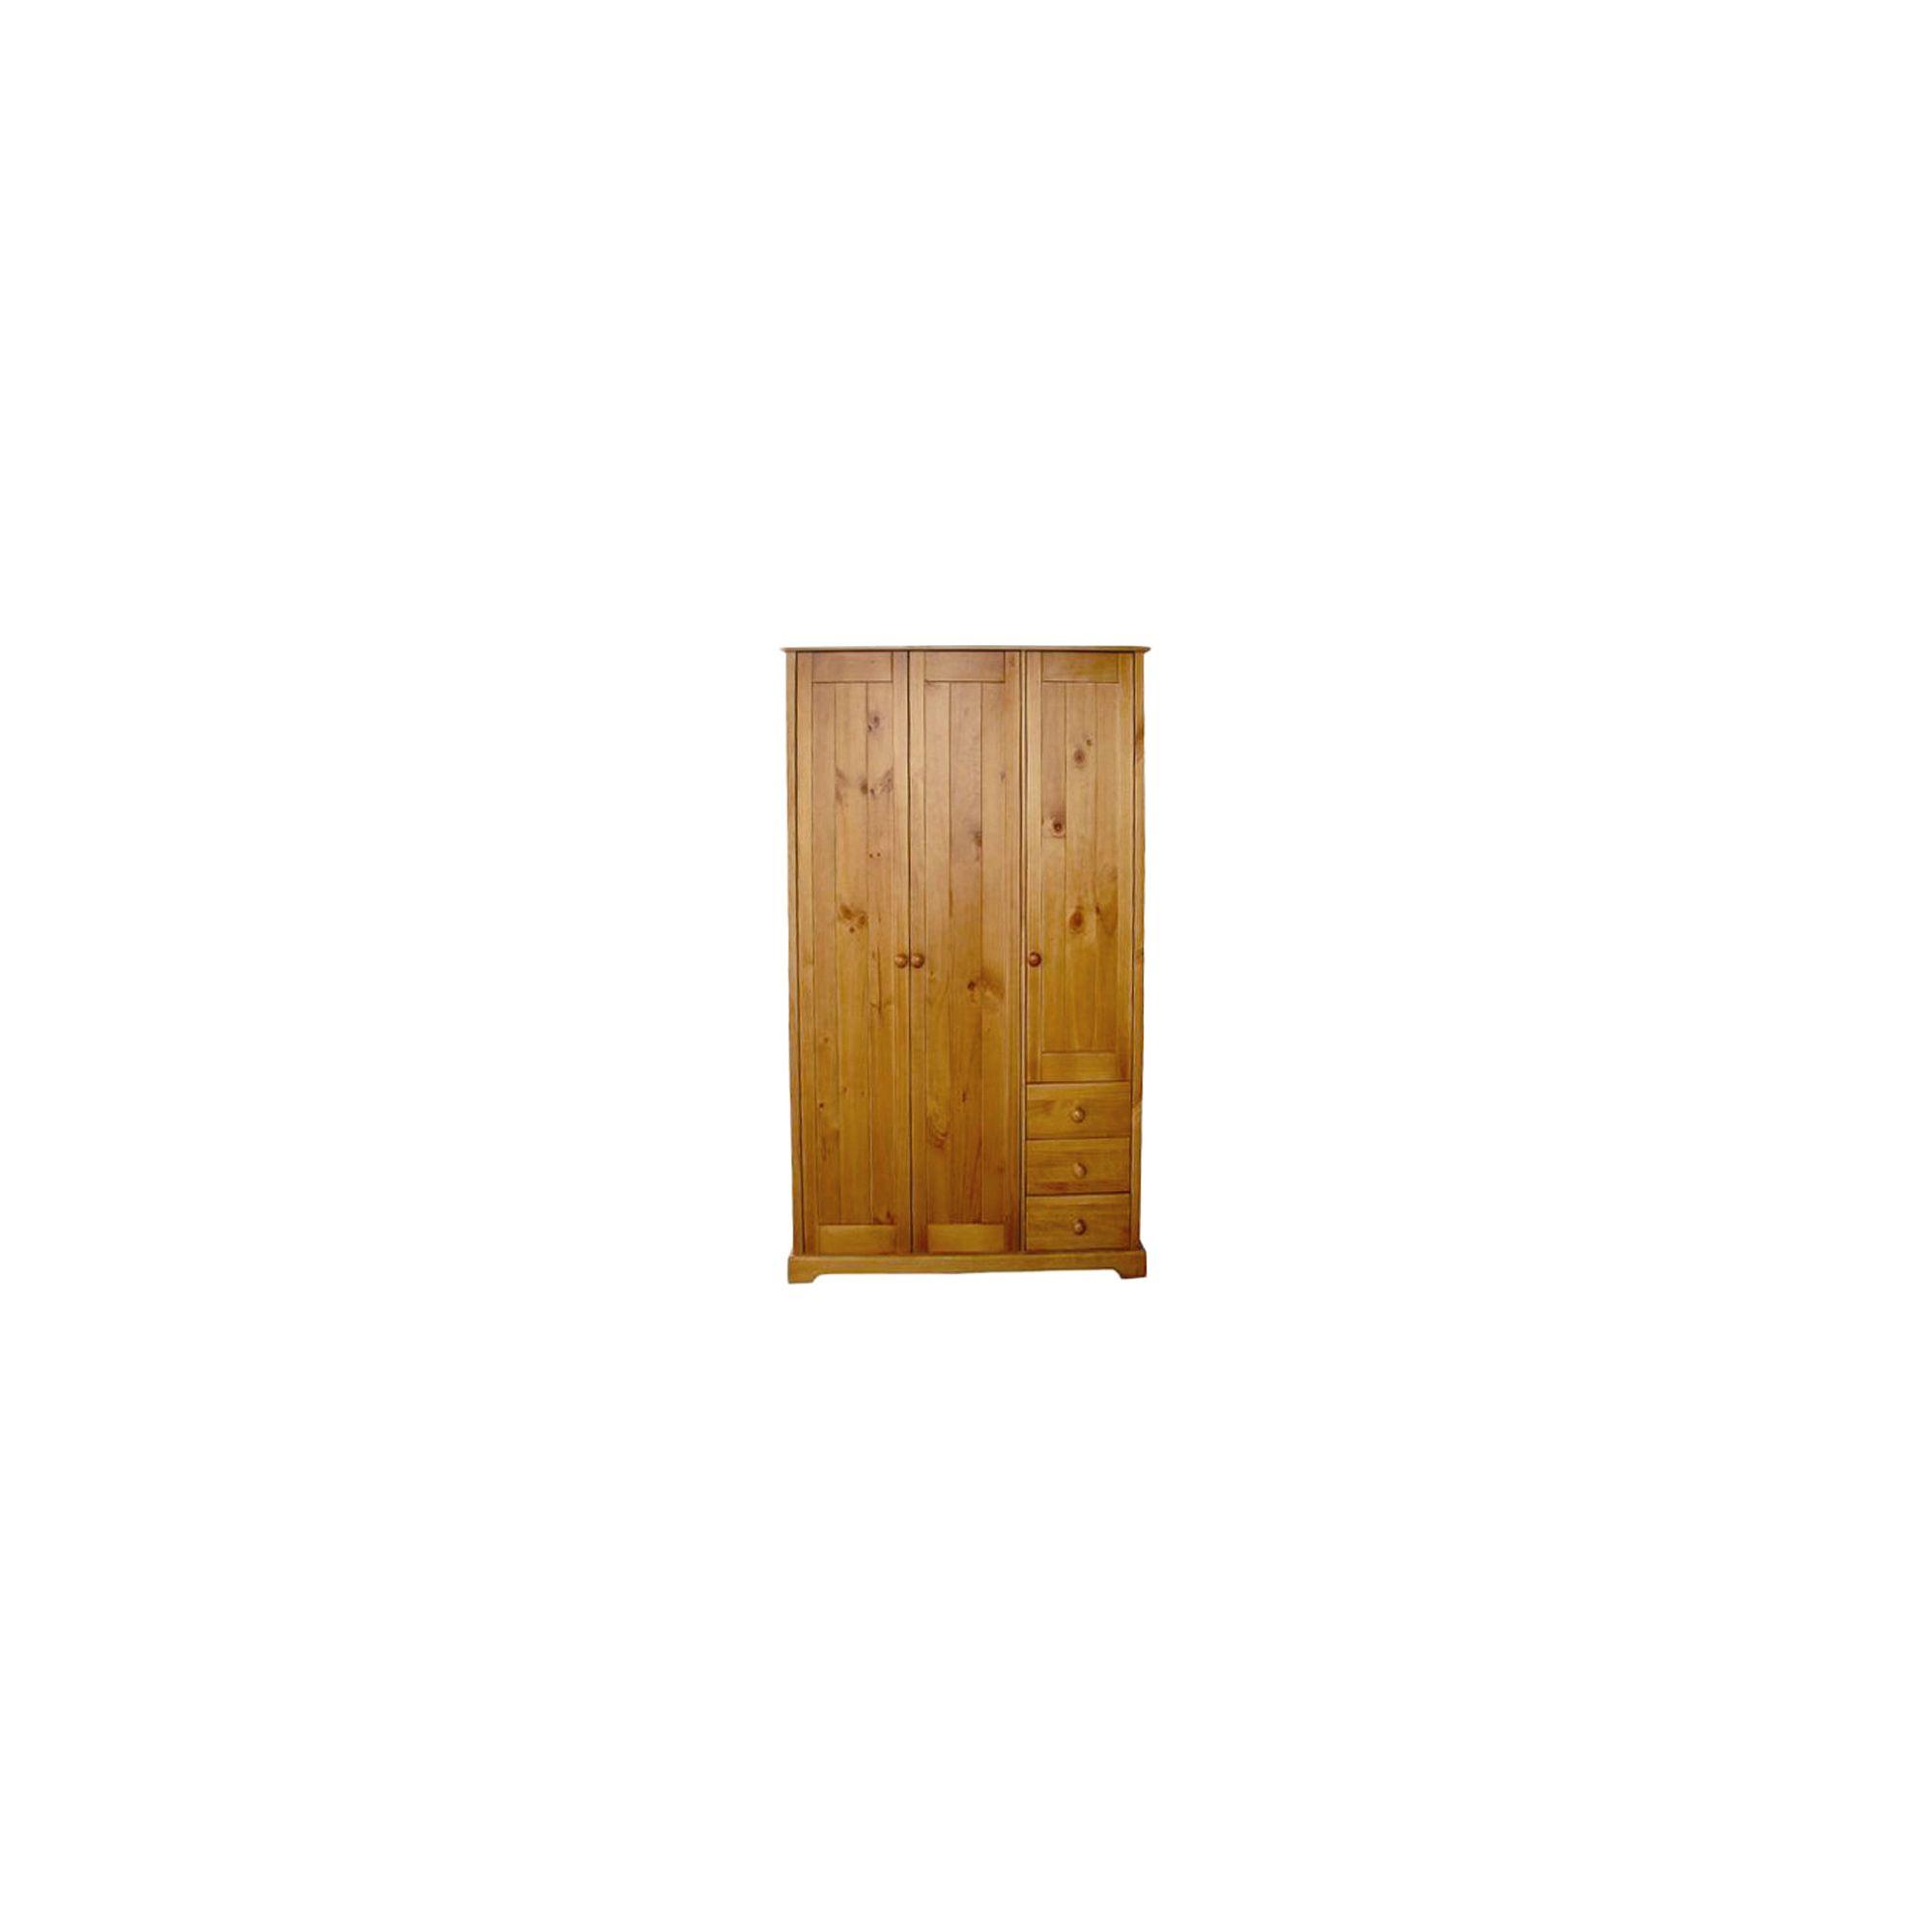 Home Zone Atlantic Three Door Wardrobe in Vintage Pine at Tesco Direct